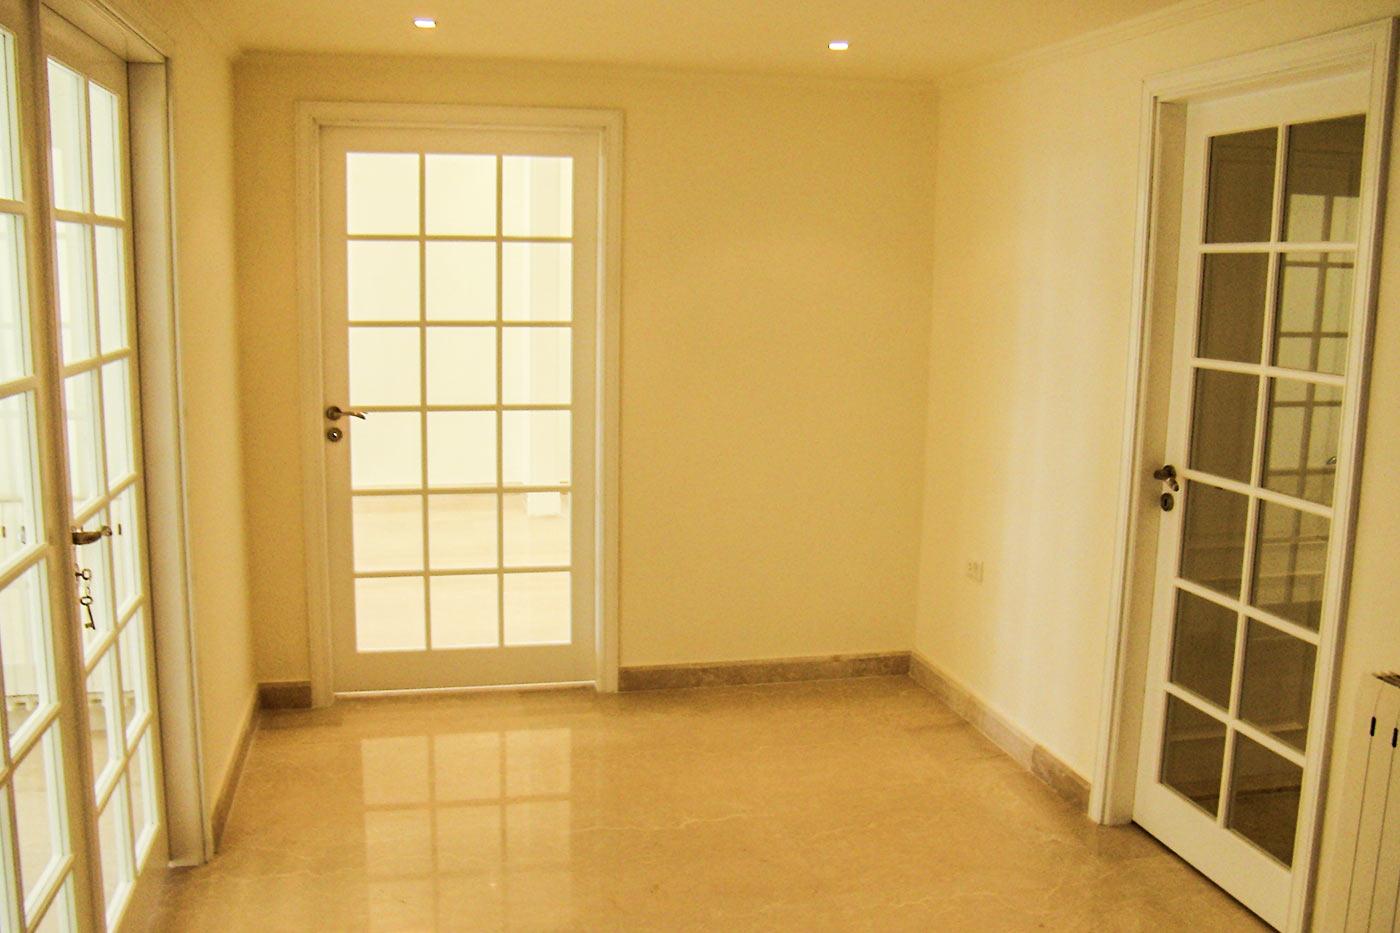 Sankari Residence - Yellow Room - 3 doors